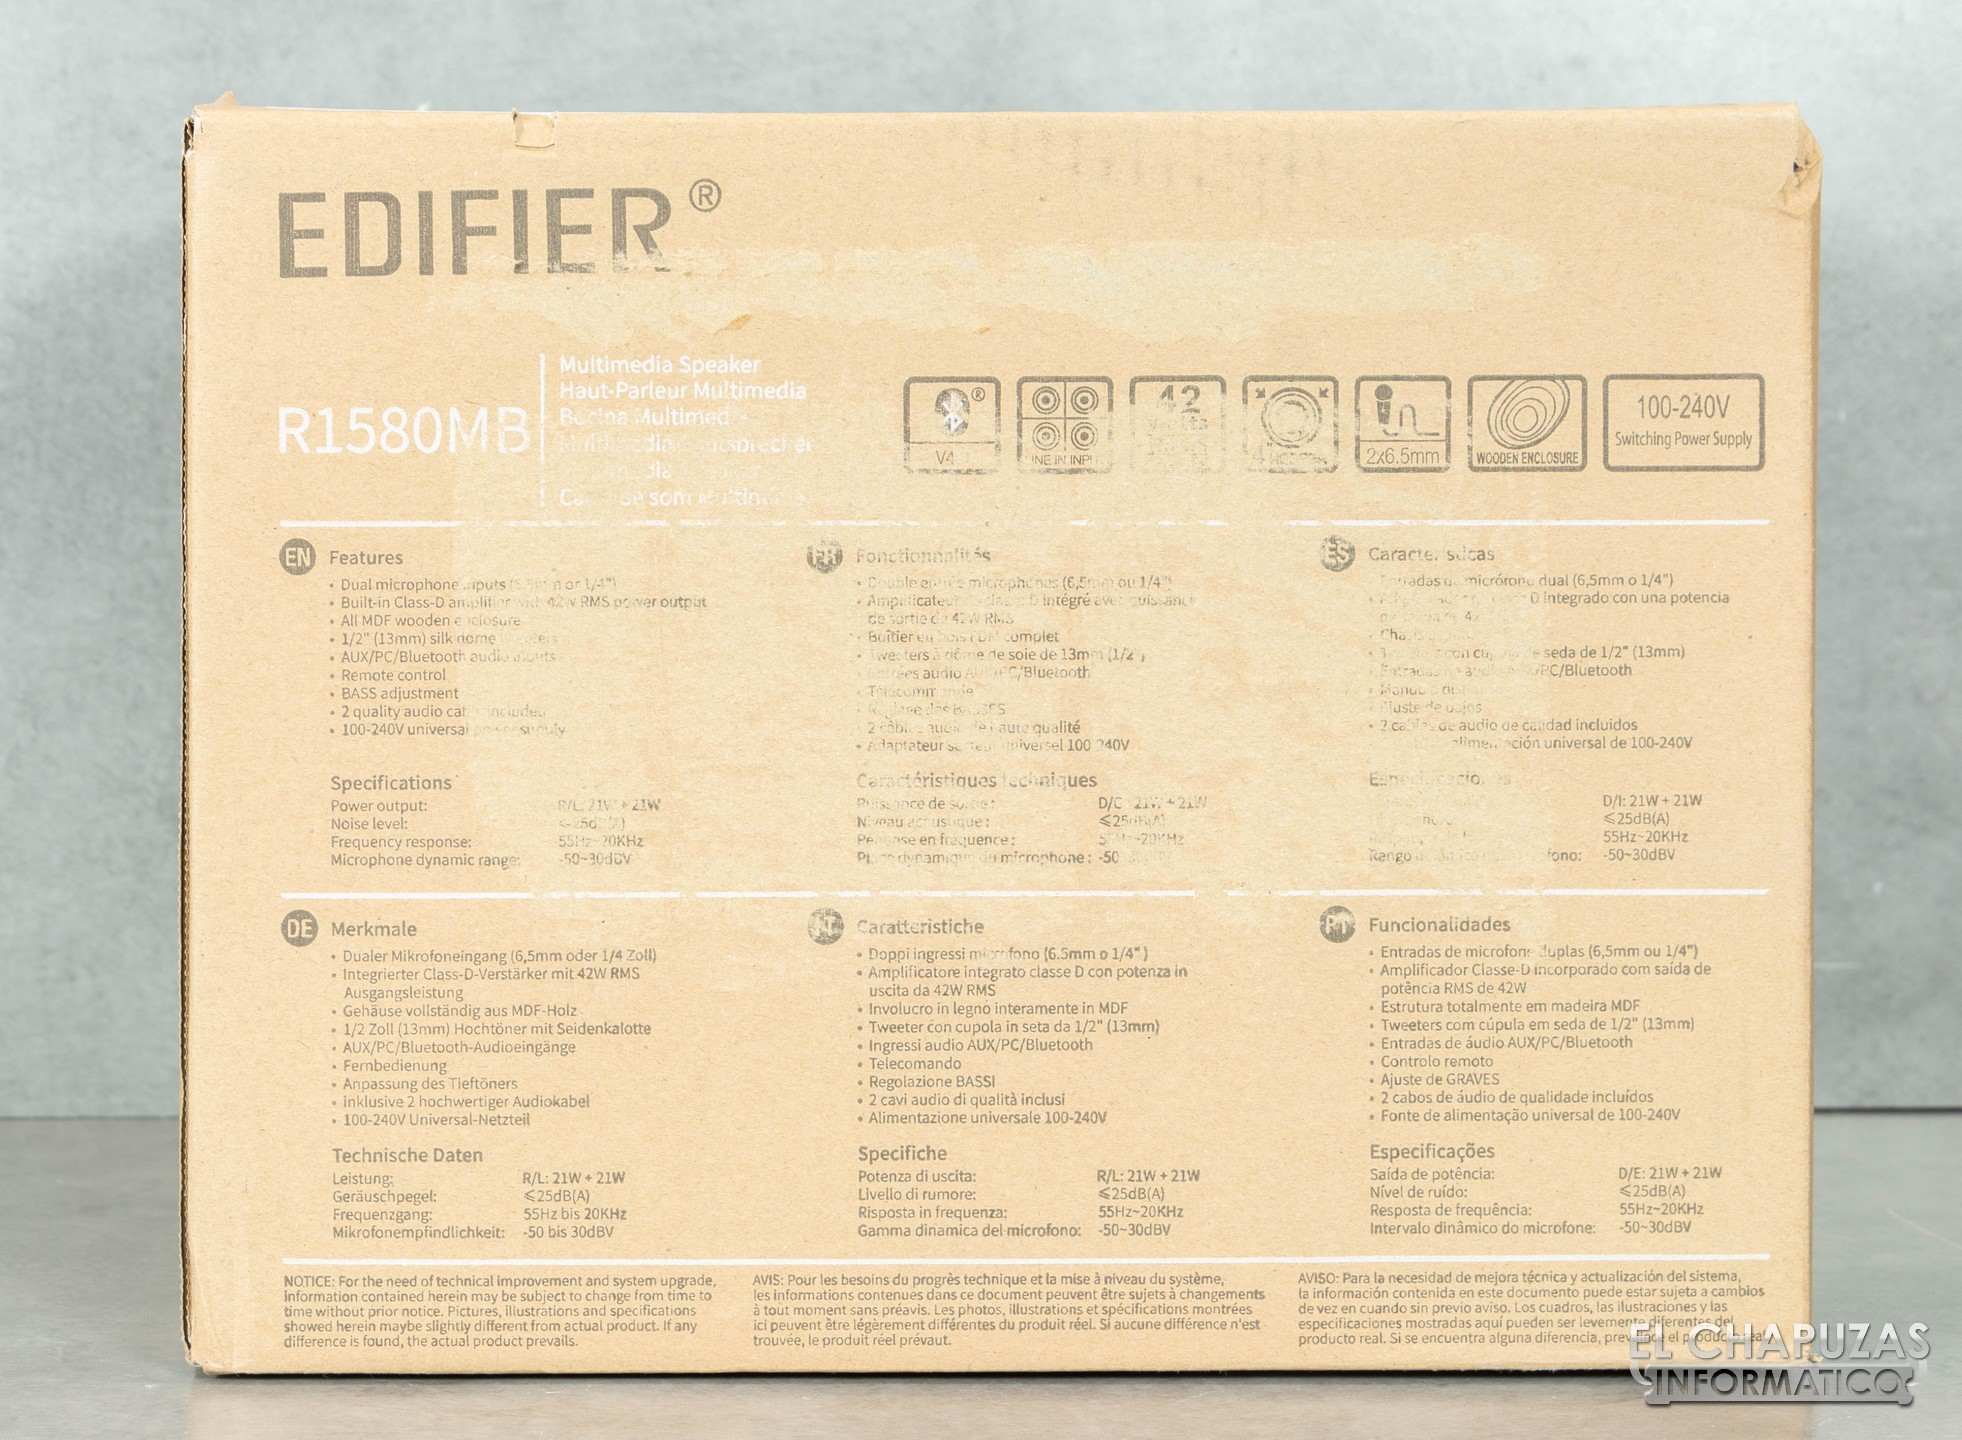 Edifier R1580MB 01 1 3